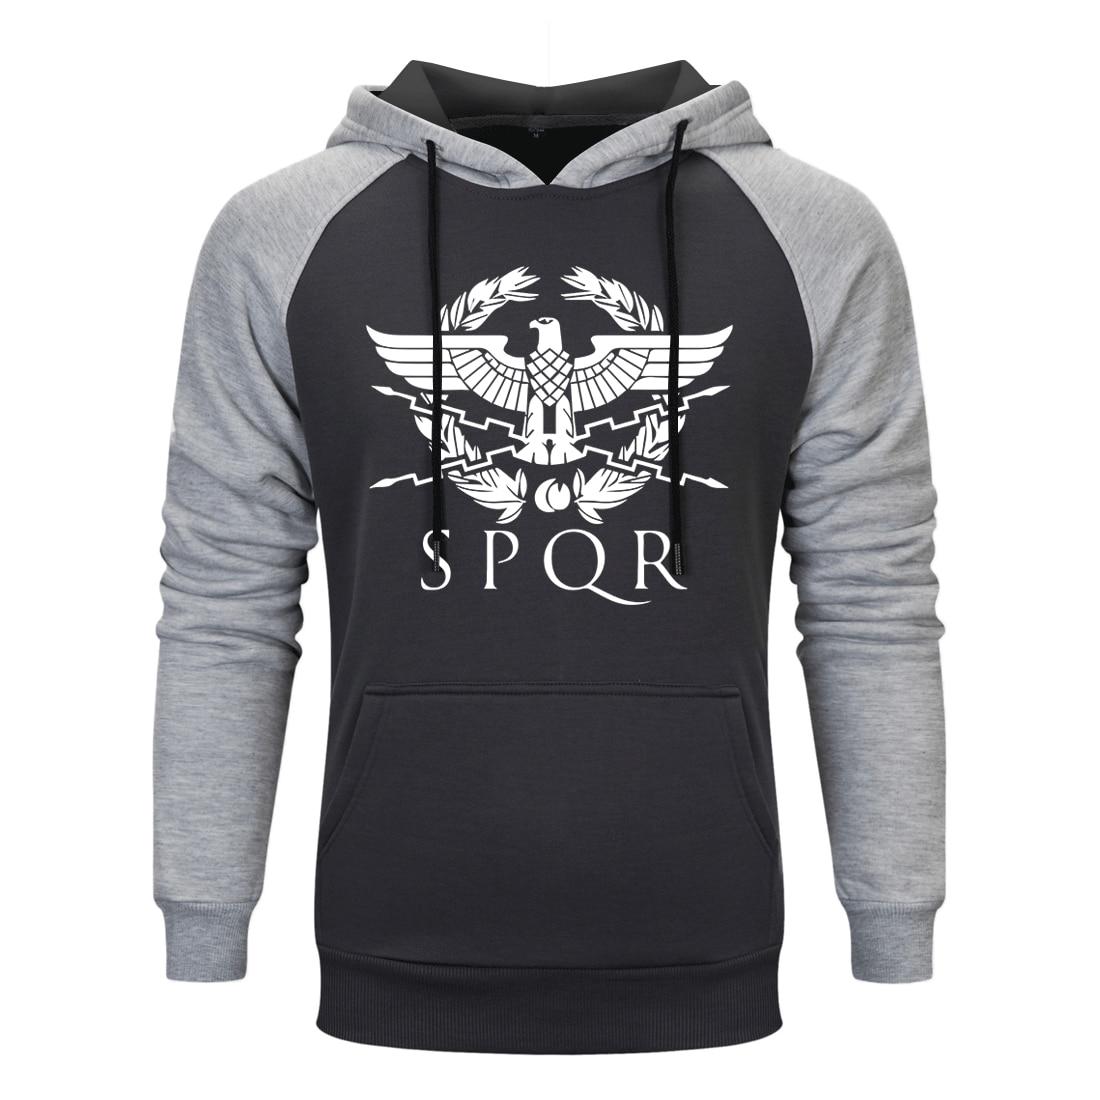 Men Print Spqr Gladiator Imperial Raglan Hoodie Mens Casual Fleeve Sweatshirt 2020 Autumn Winter Clothing Male Casual Sportswear